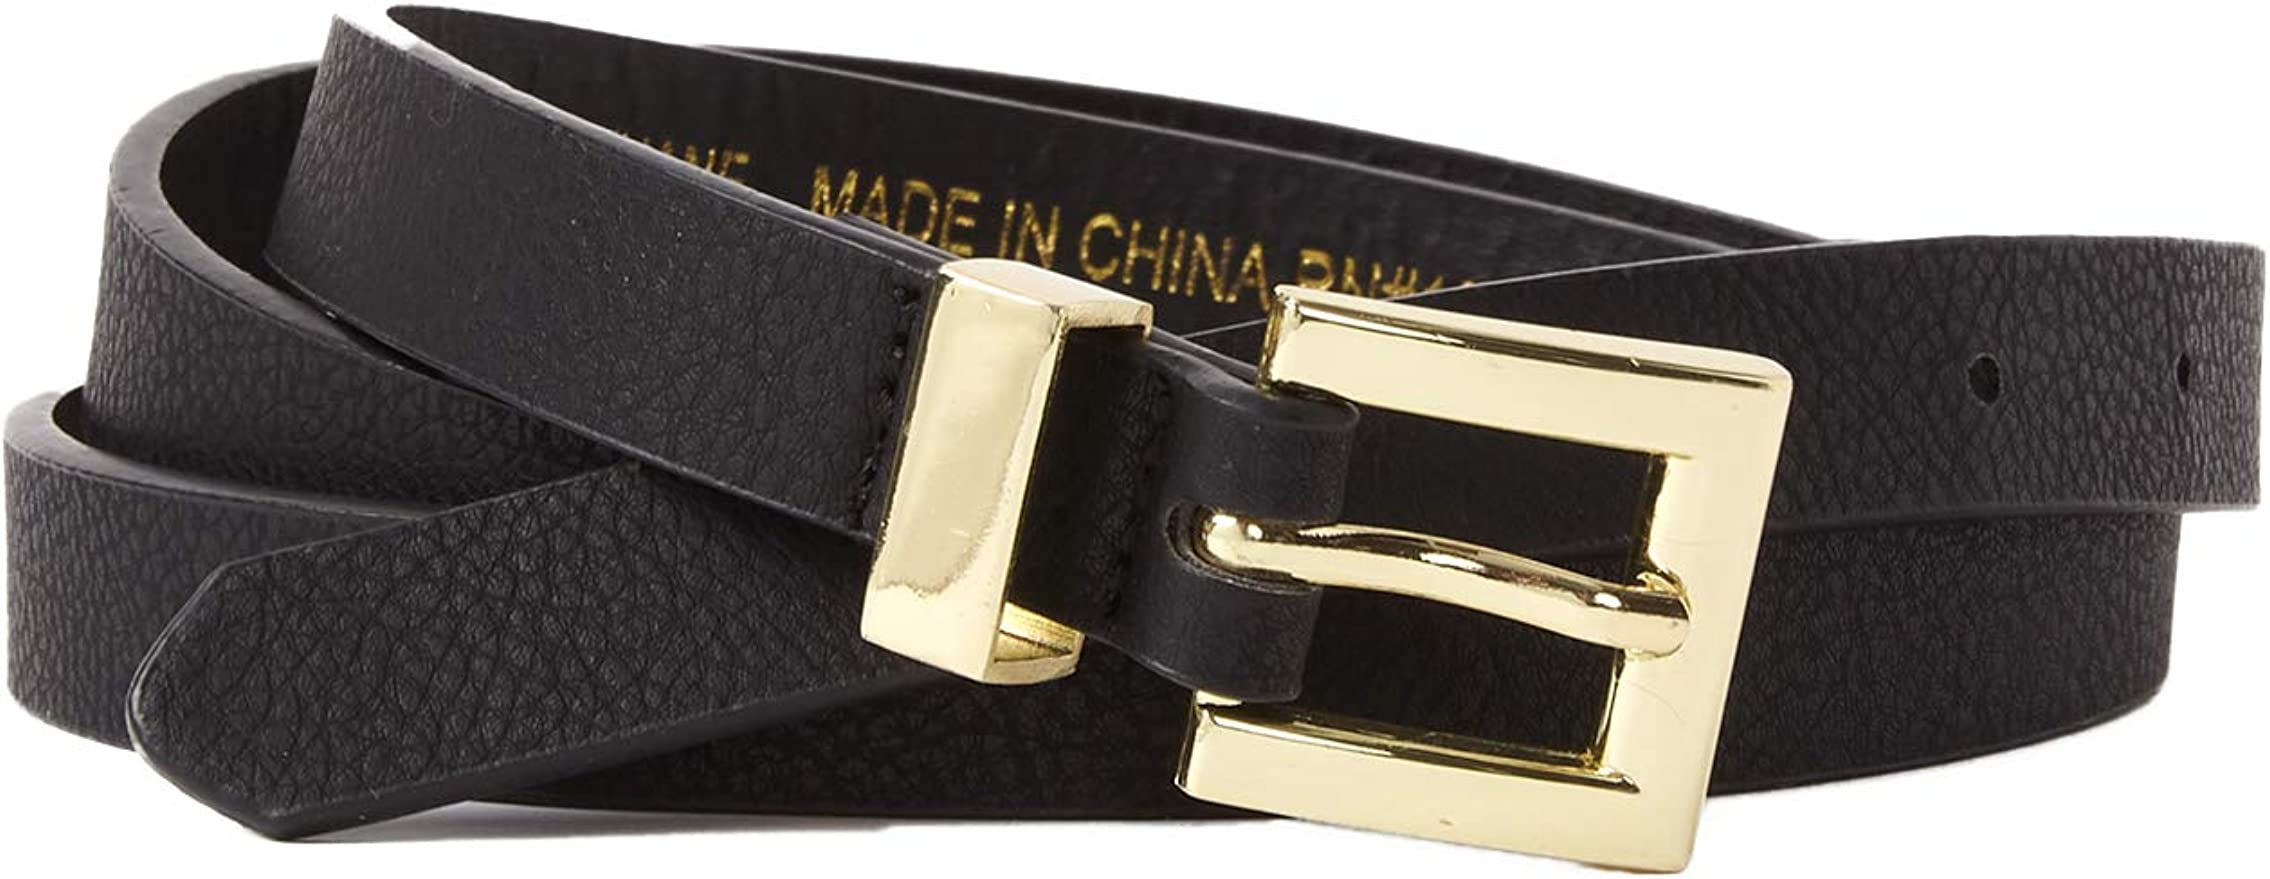 Womens Plus Size Belts Ladies Faux Leather Criss Cross Buckle Waist Accessories